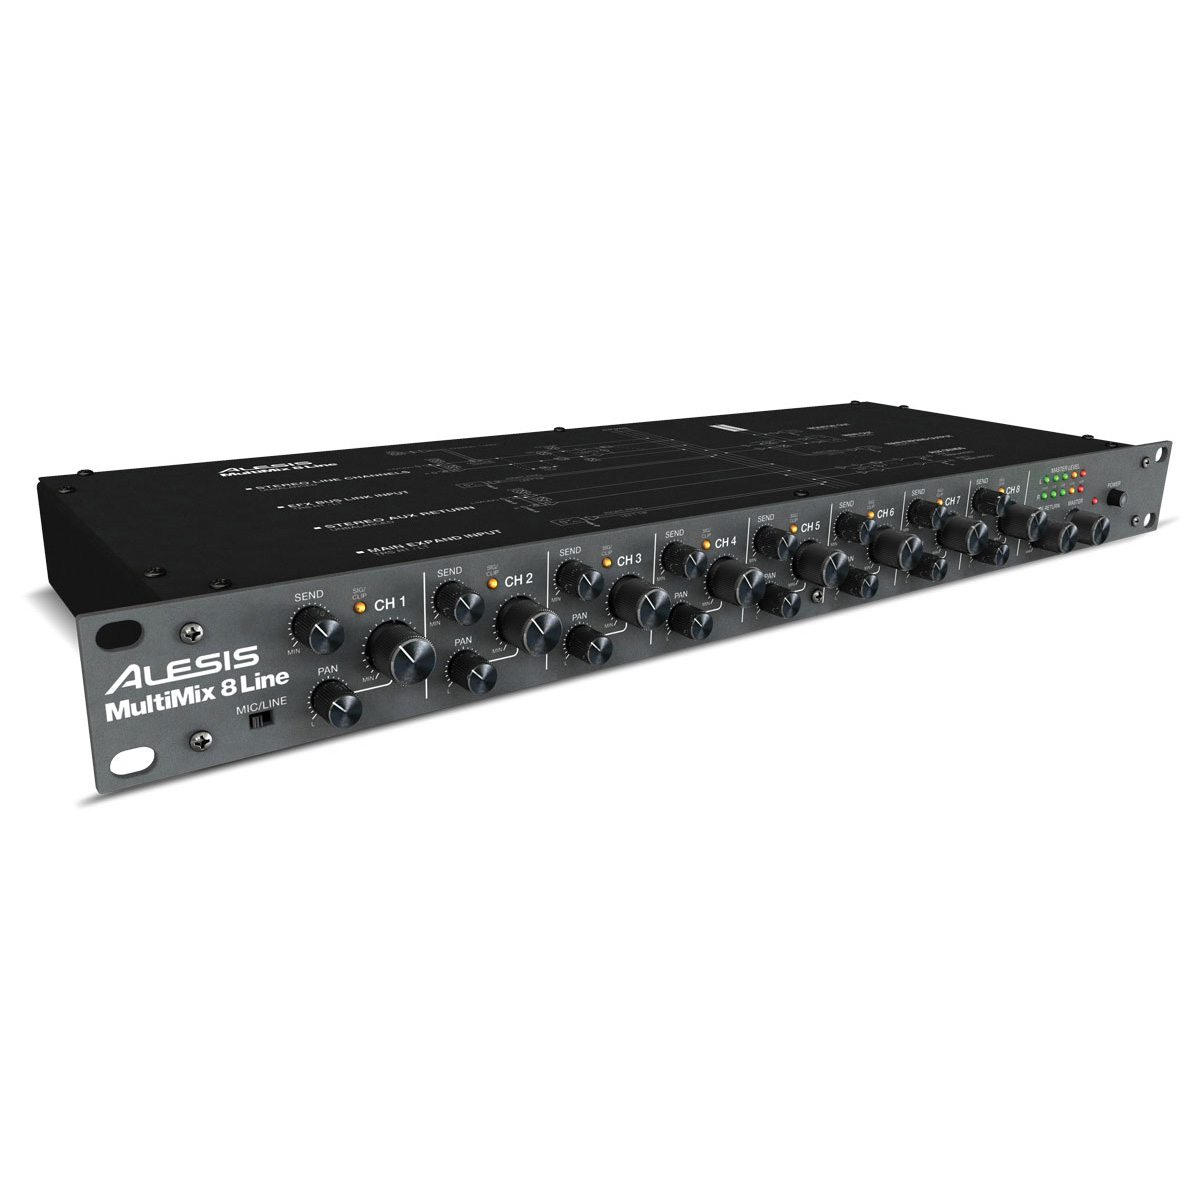 Rane SM-82 vs Alesis MULTIMIX 8 LINE - Gearslutz Pro Audio ...